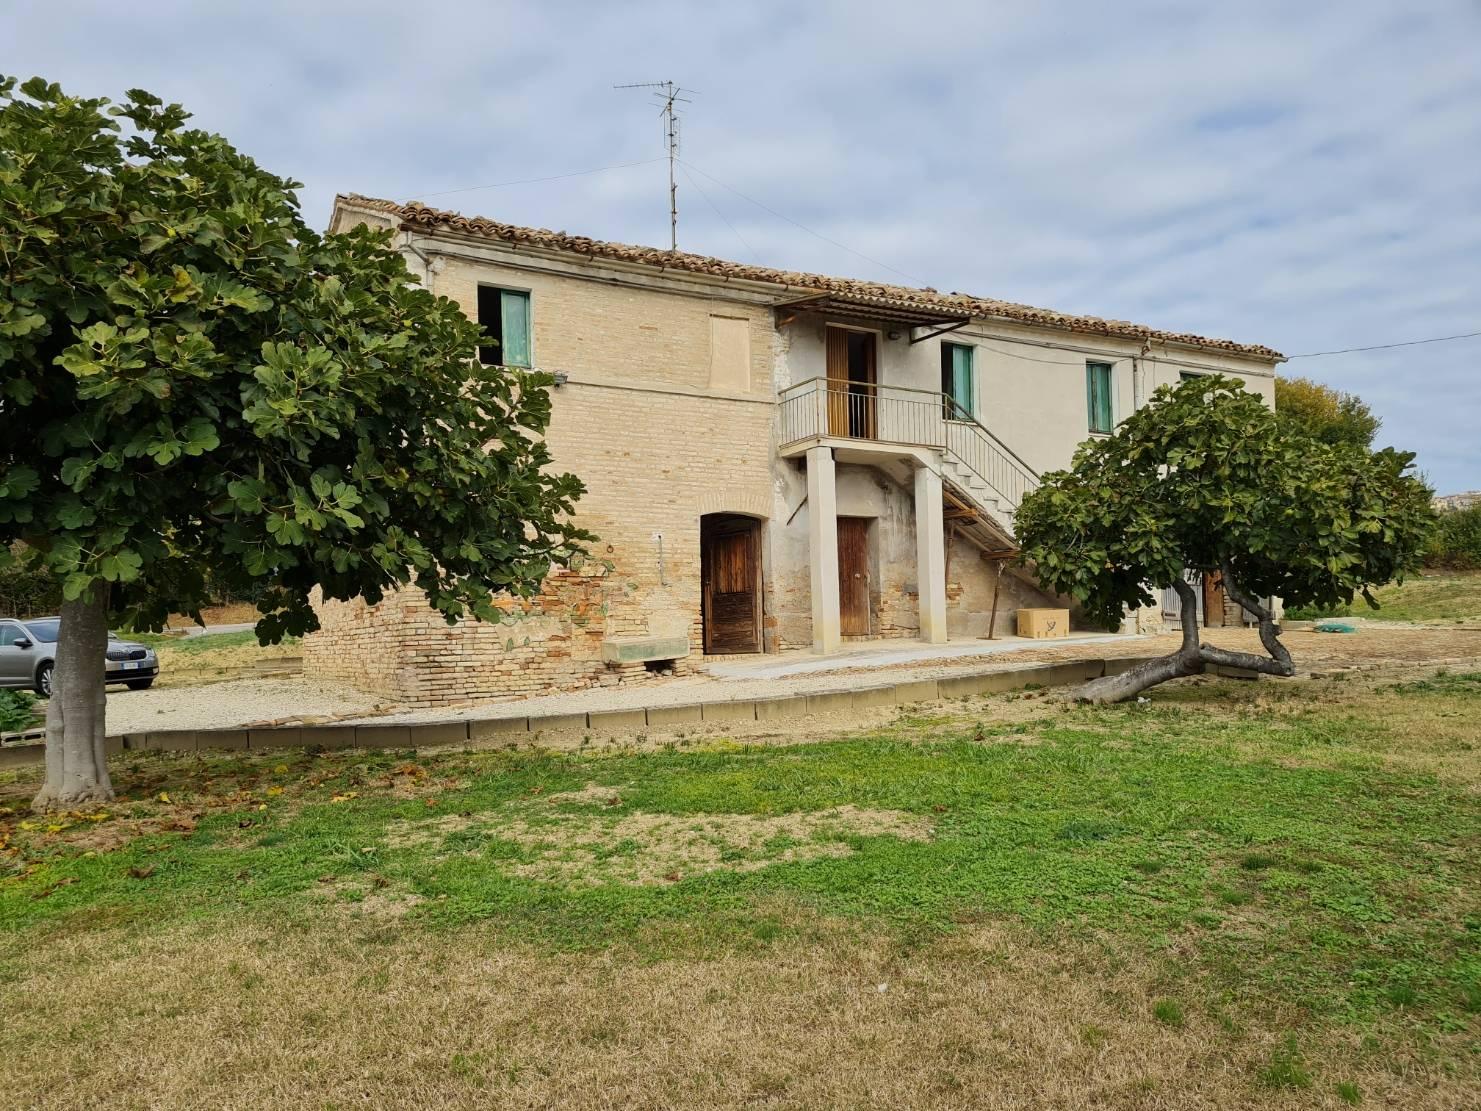 Casale a Recanati (Macerata)